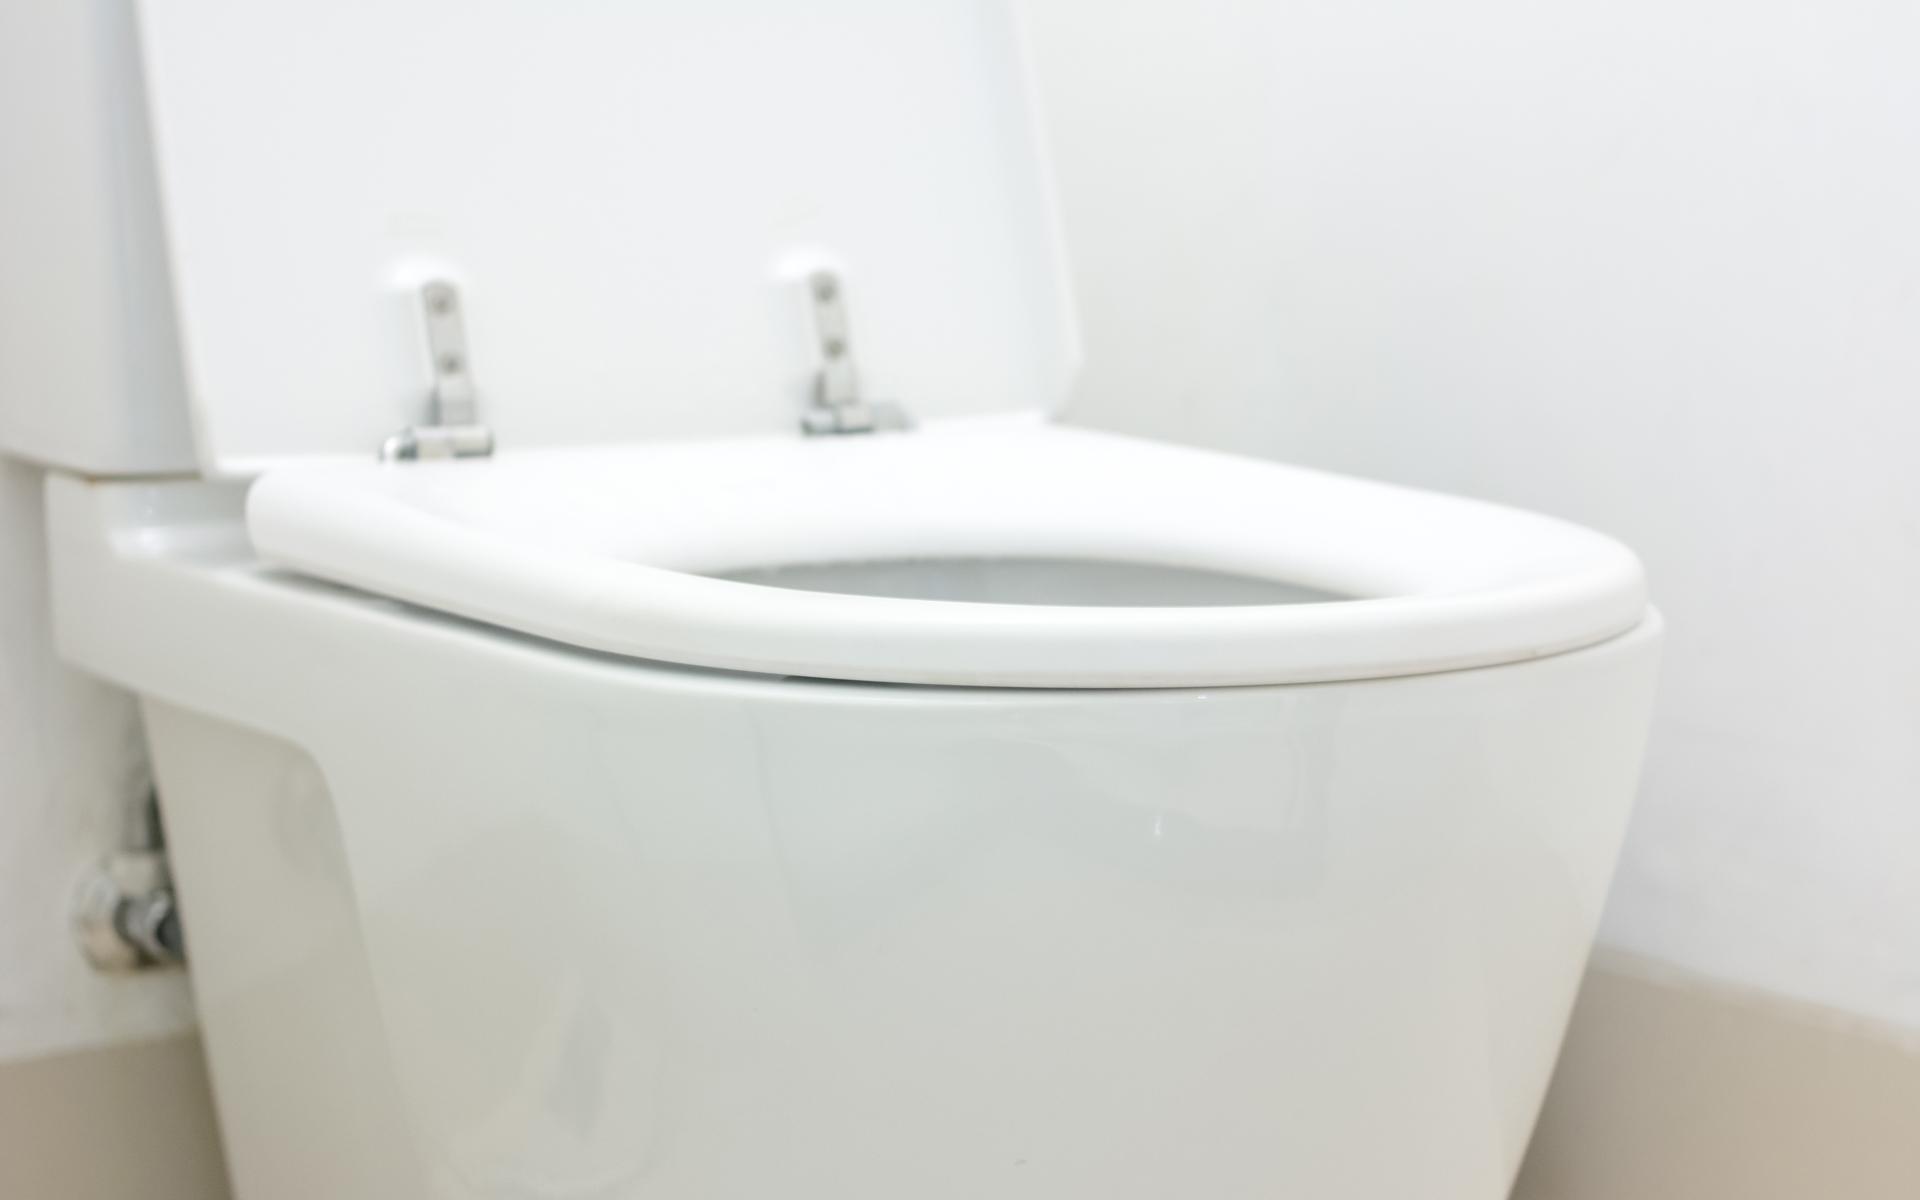 Lexington Toilet Repair